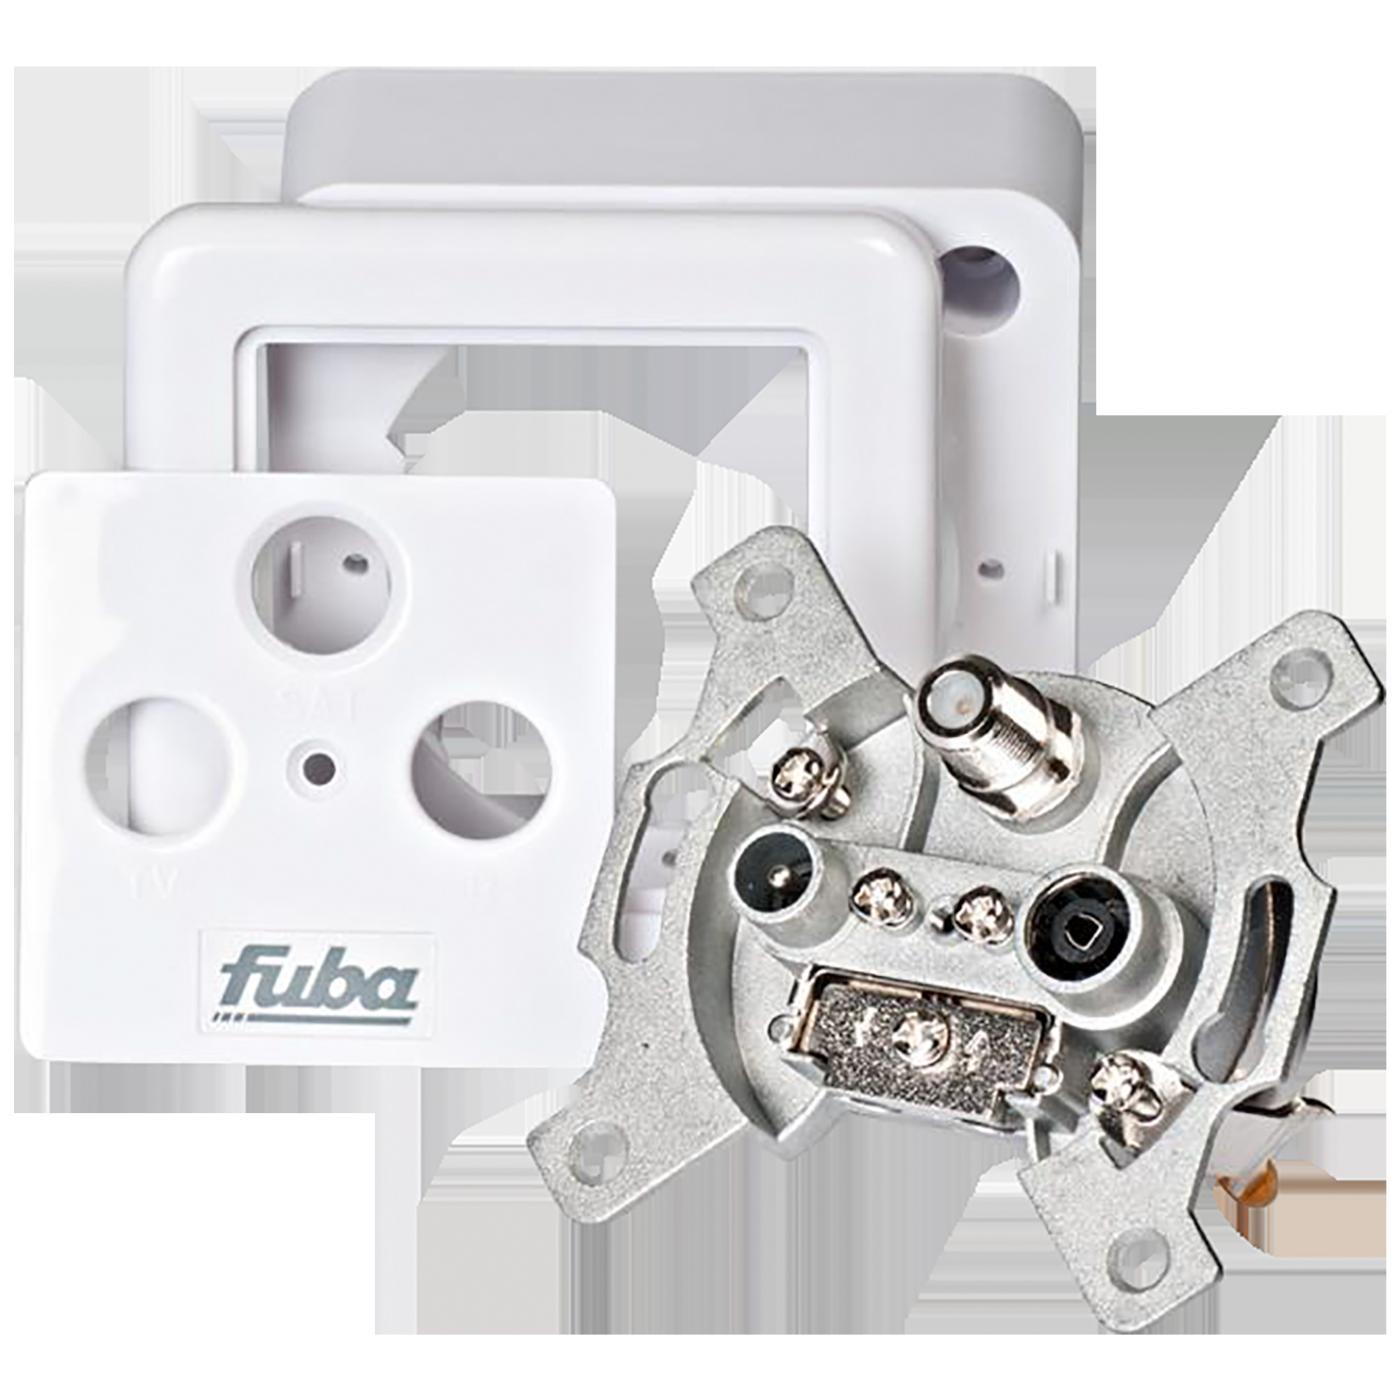 fuba - GAD 310 DC